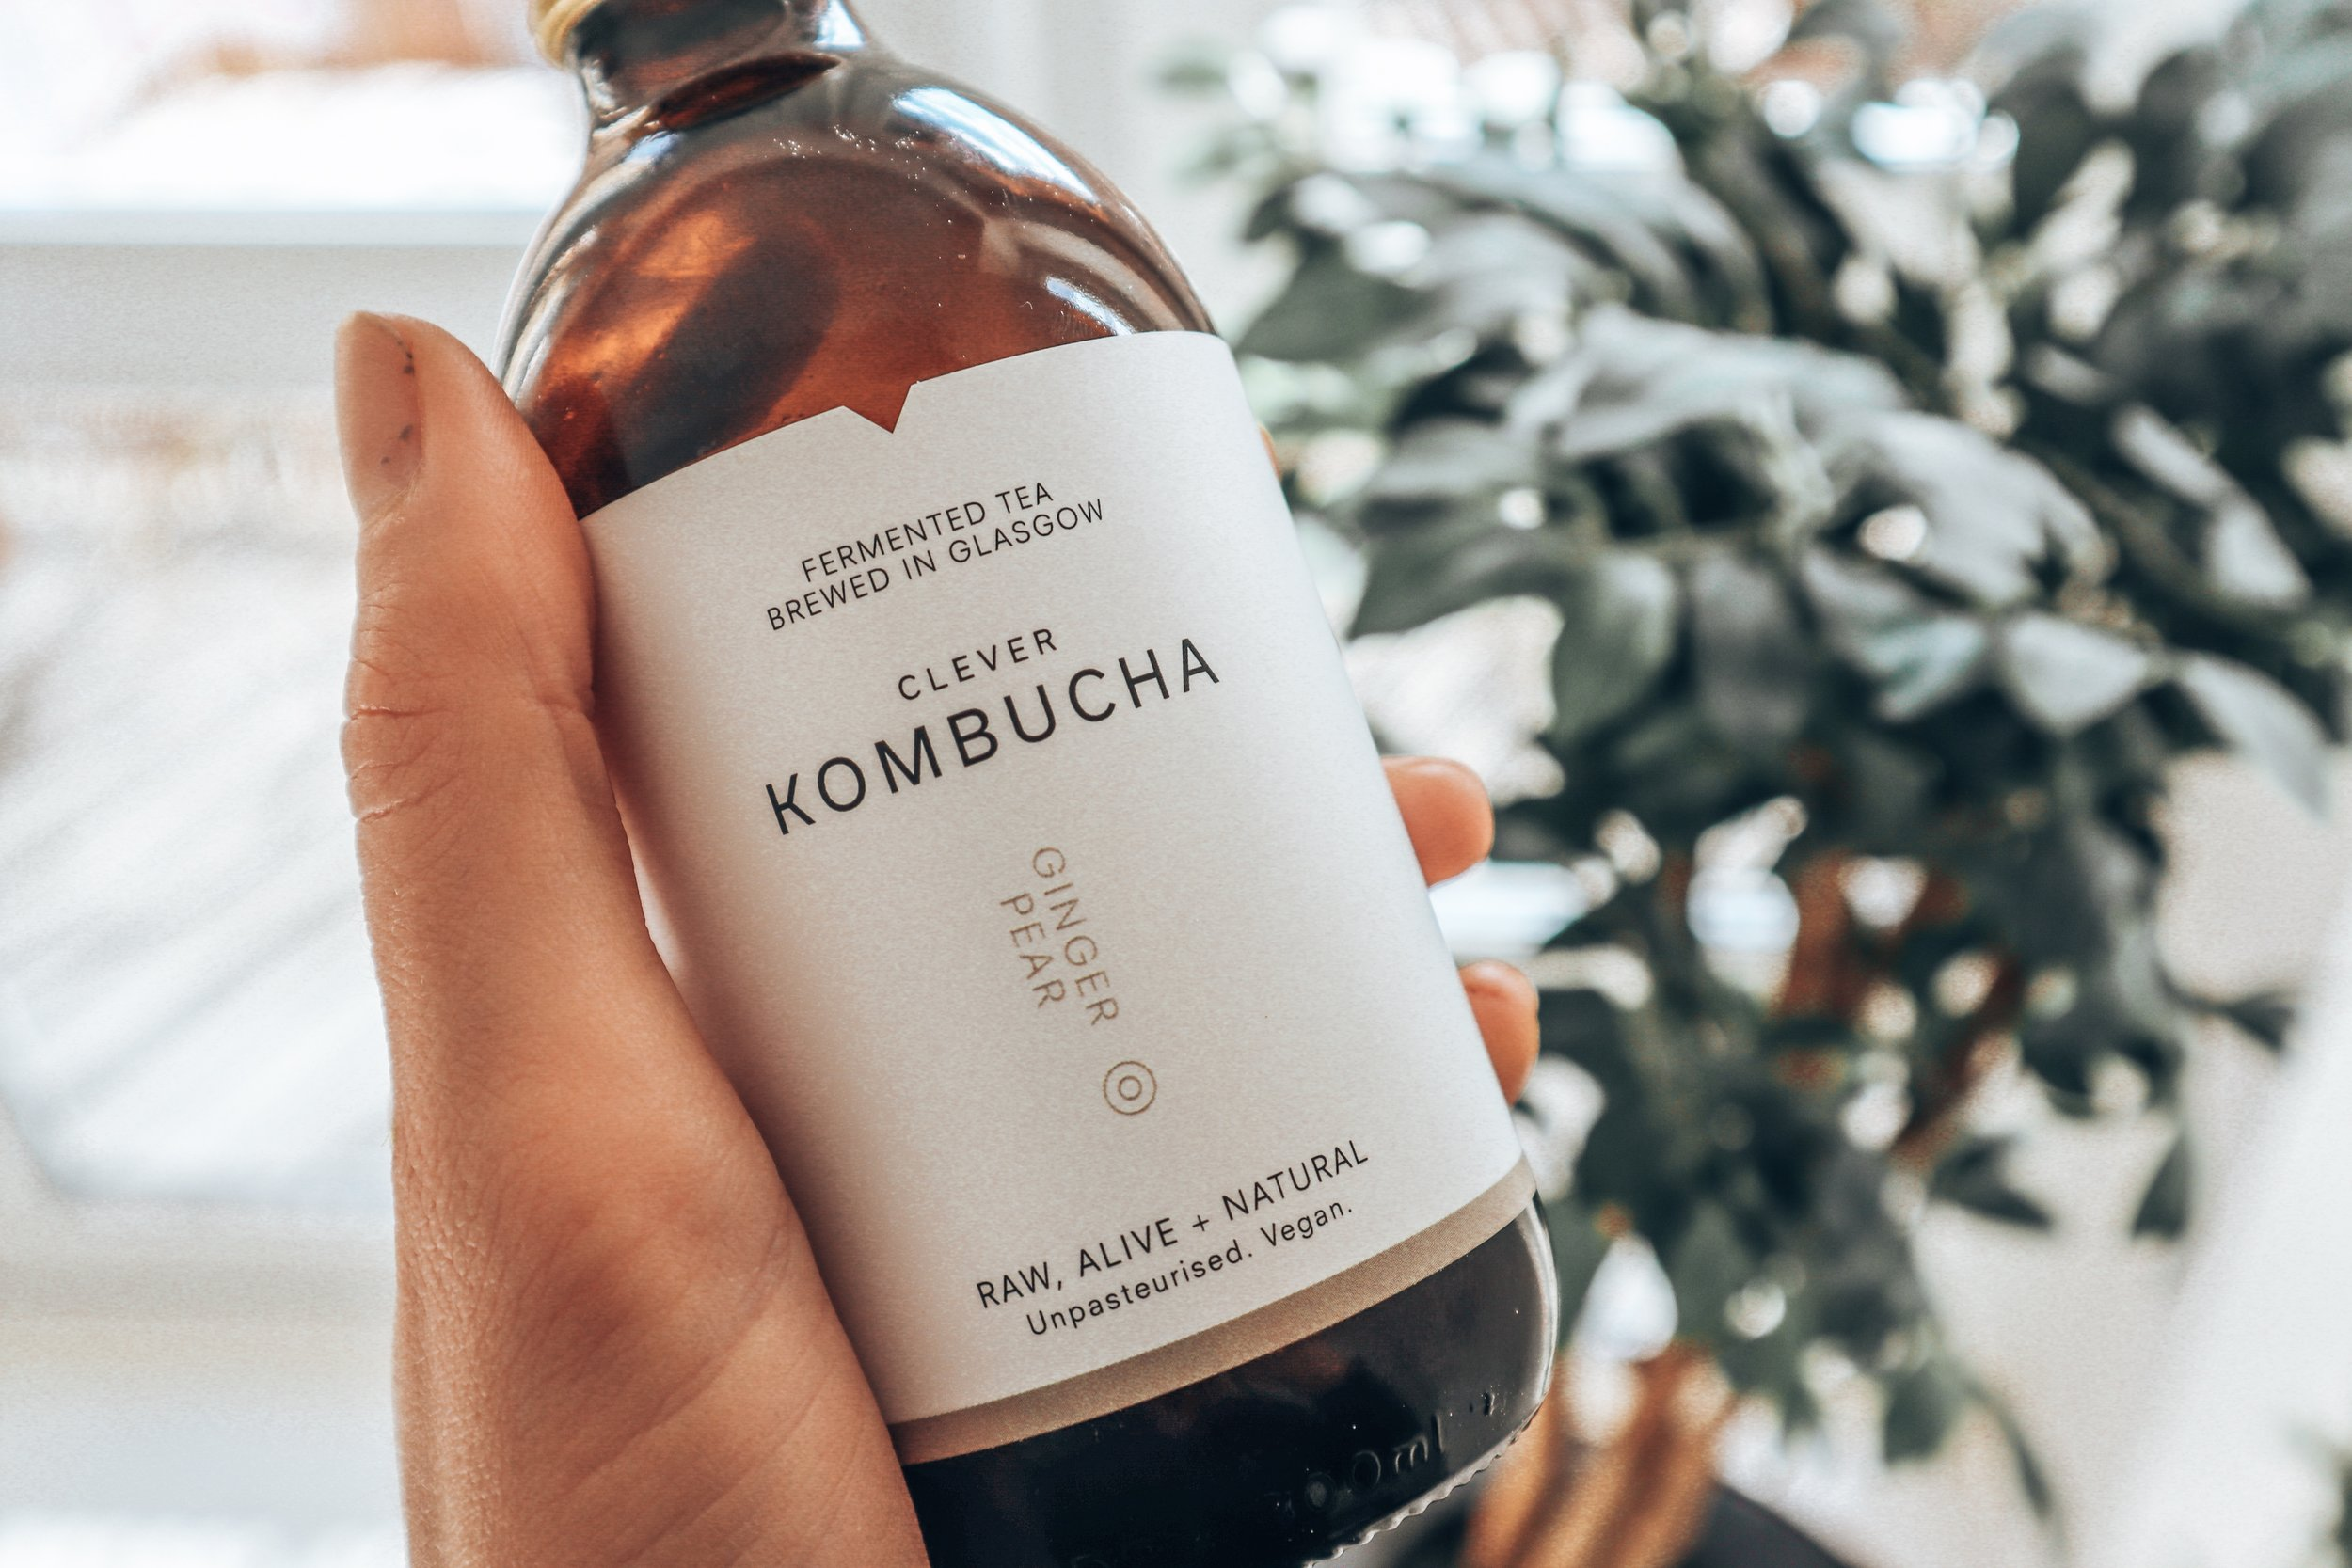 KOMBUCHA -